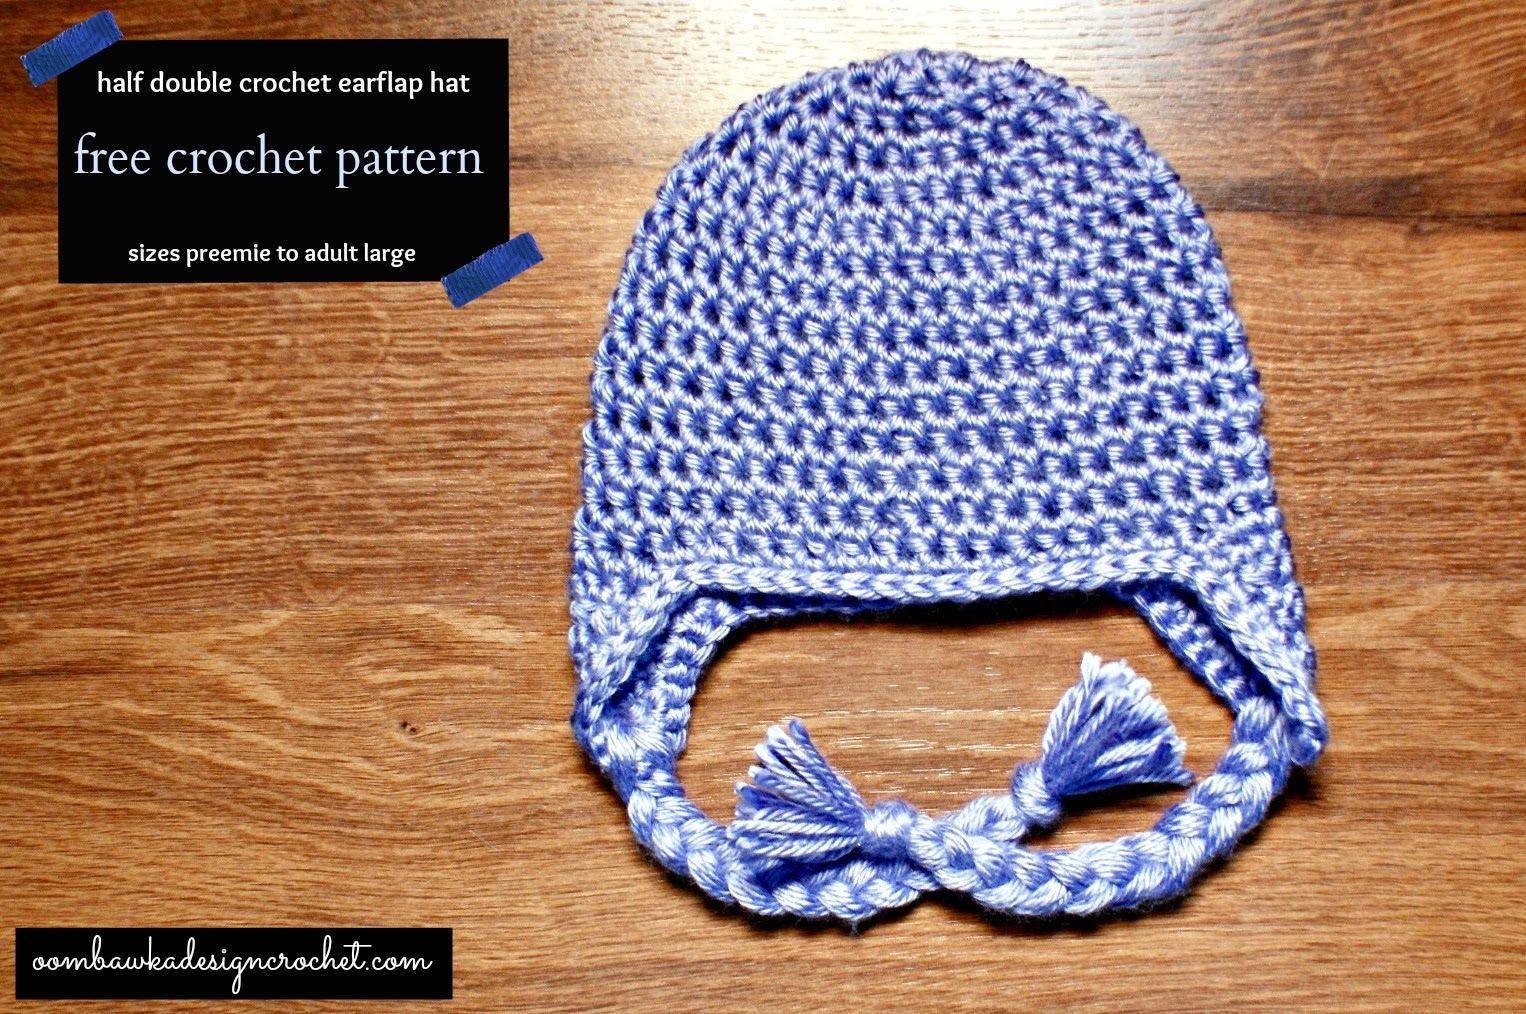 5fe2ef93816 Crochet Earflap Hat Pattern Oombawka Design HOT on Ravelry! This lovely  crochet hat pattern by  OombawkaDesign! It MUST almost be hat season! I  love it!!